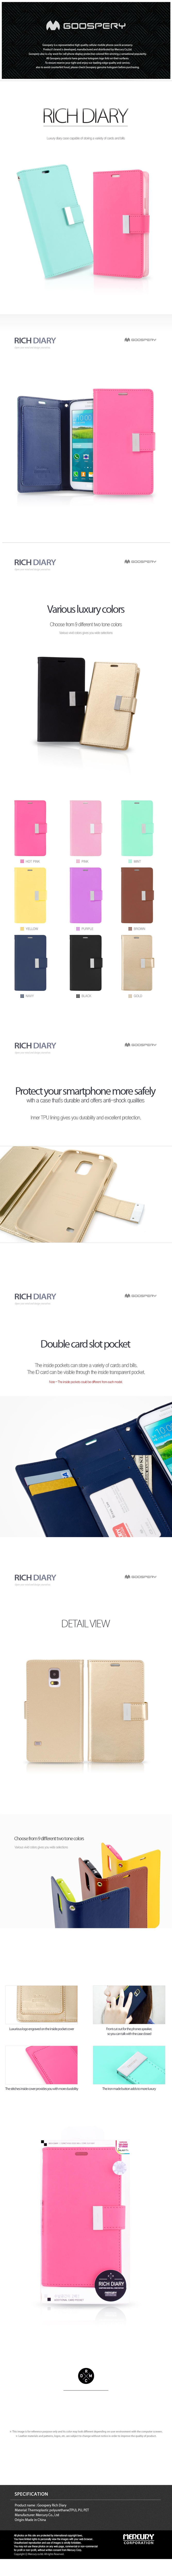 RICH_DIARY_detail_eng